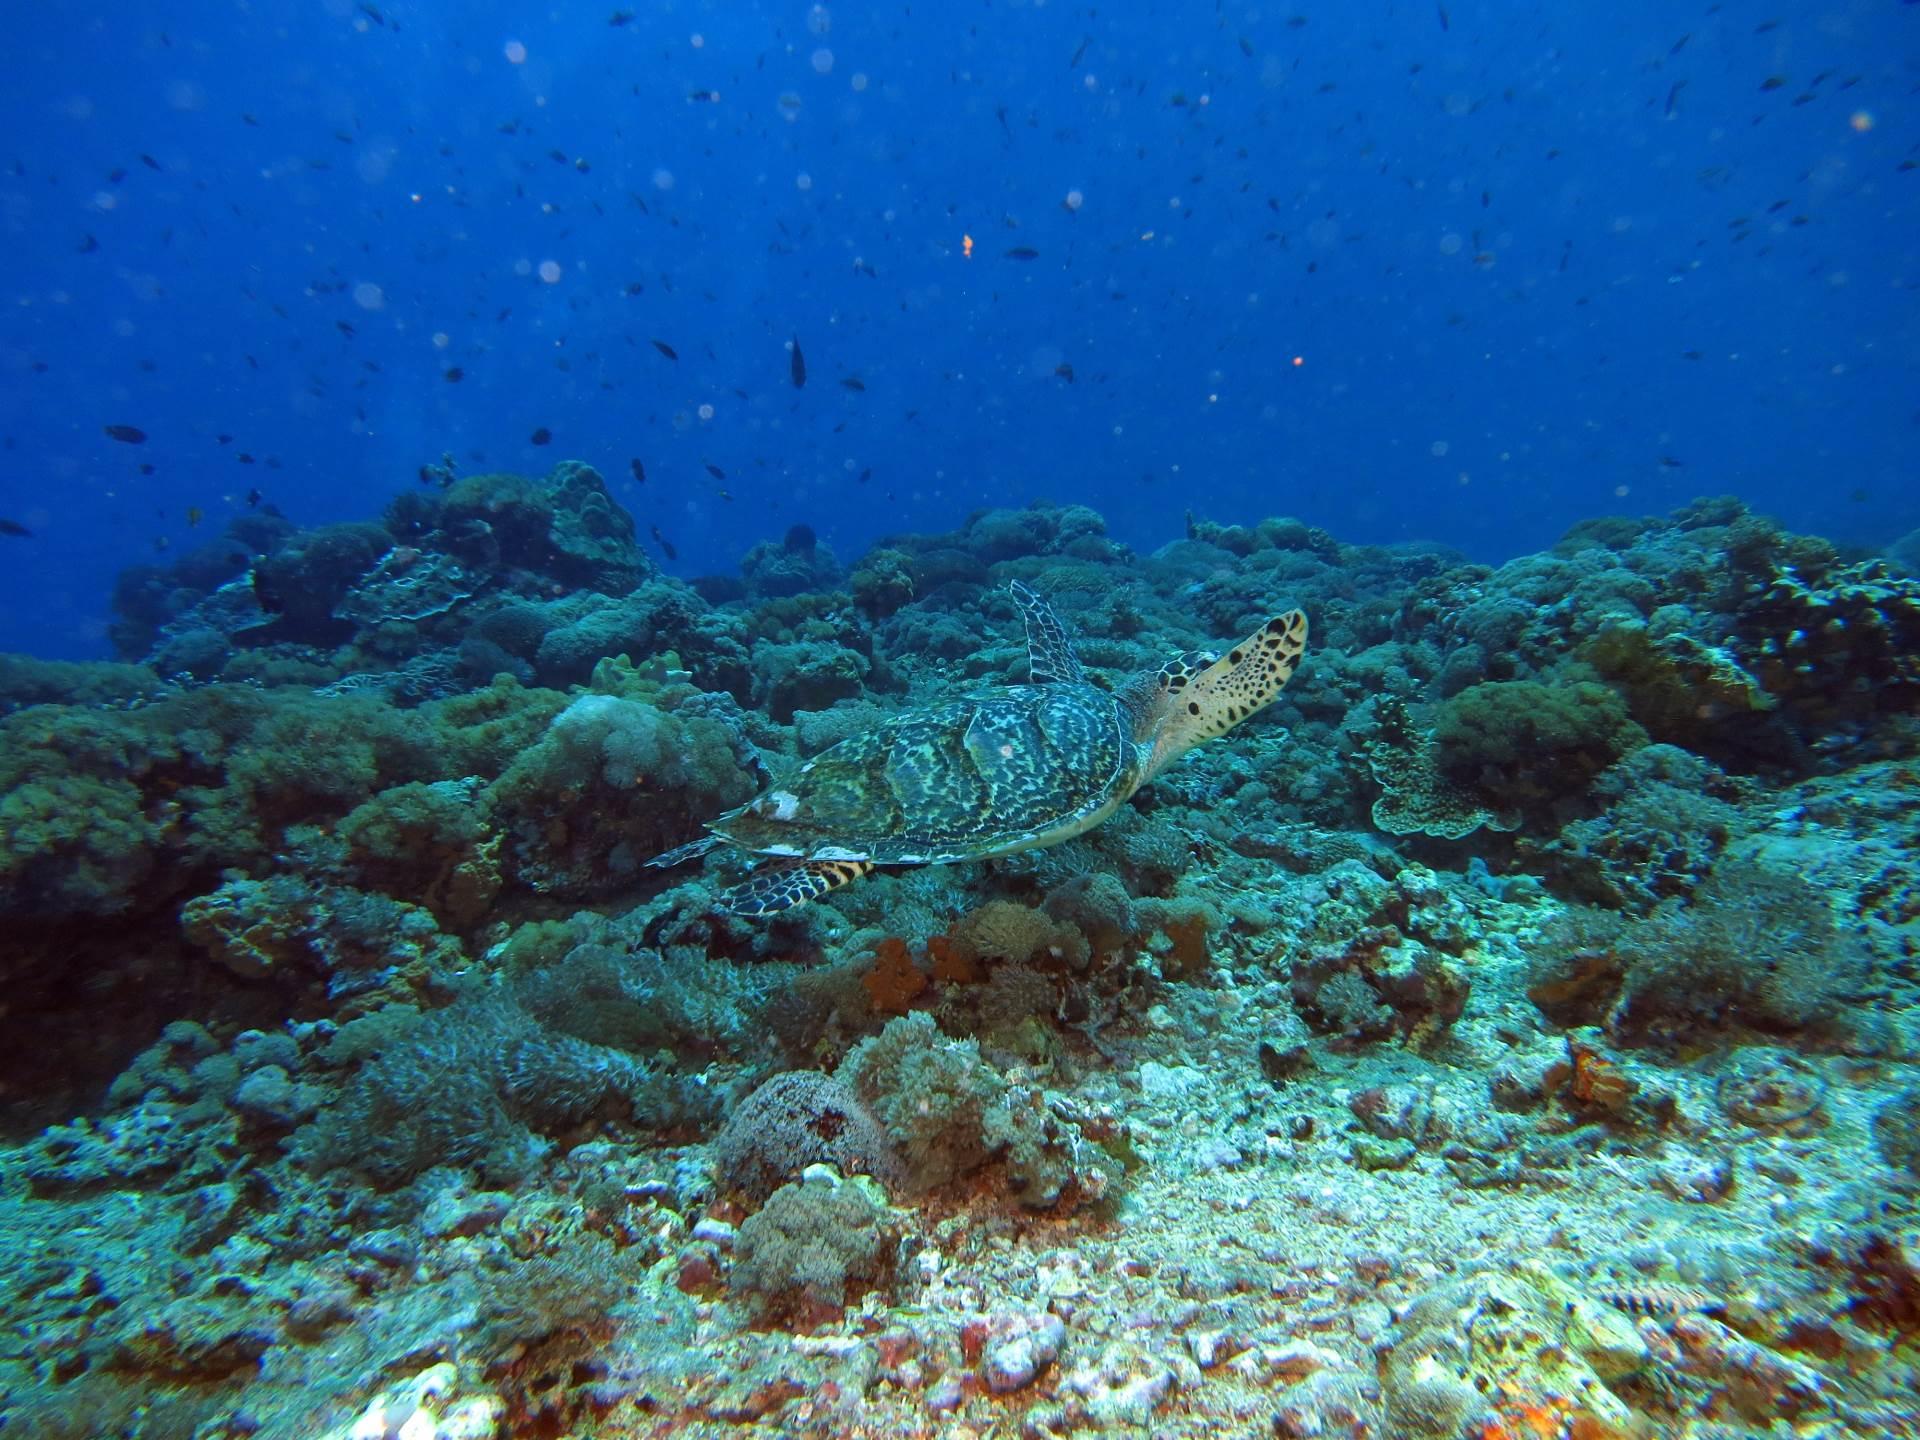 Turtle encounter at Mabul Island